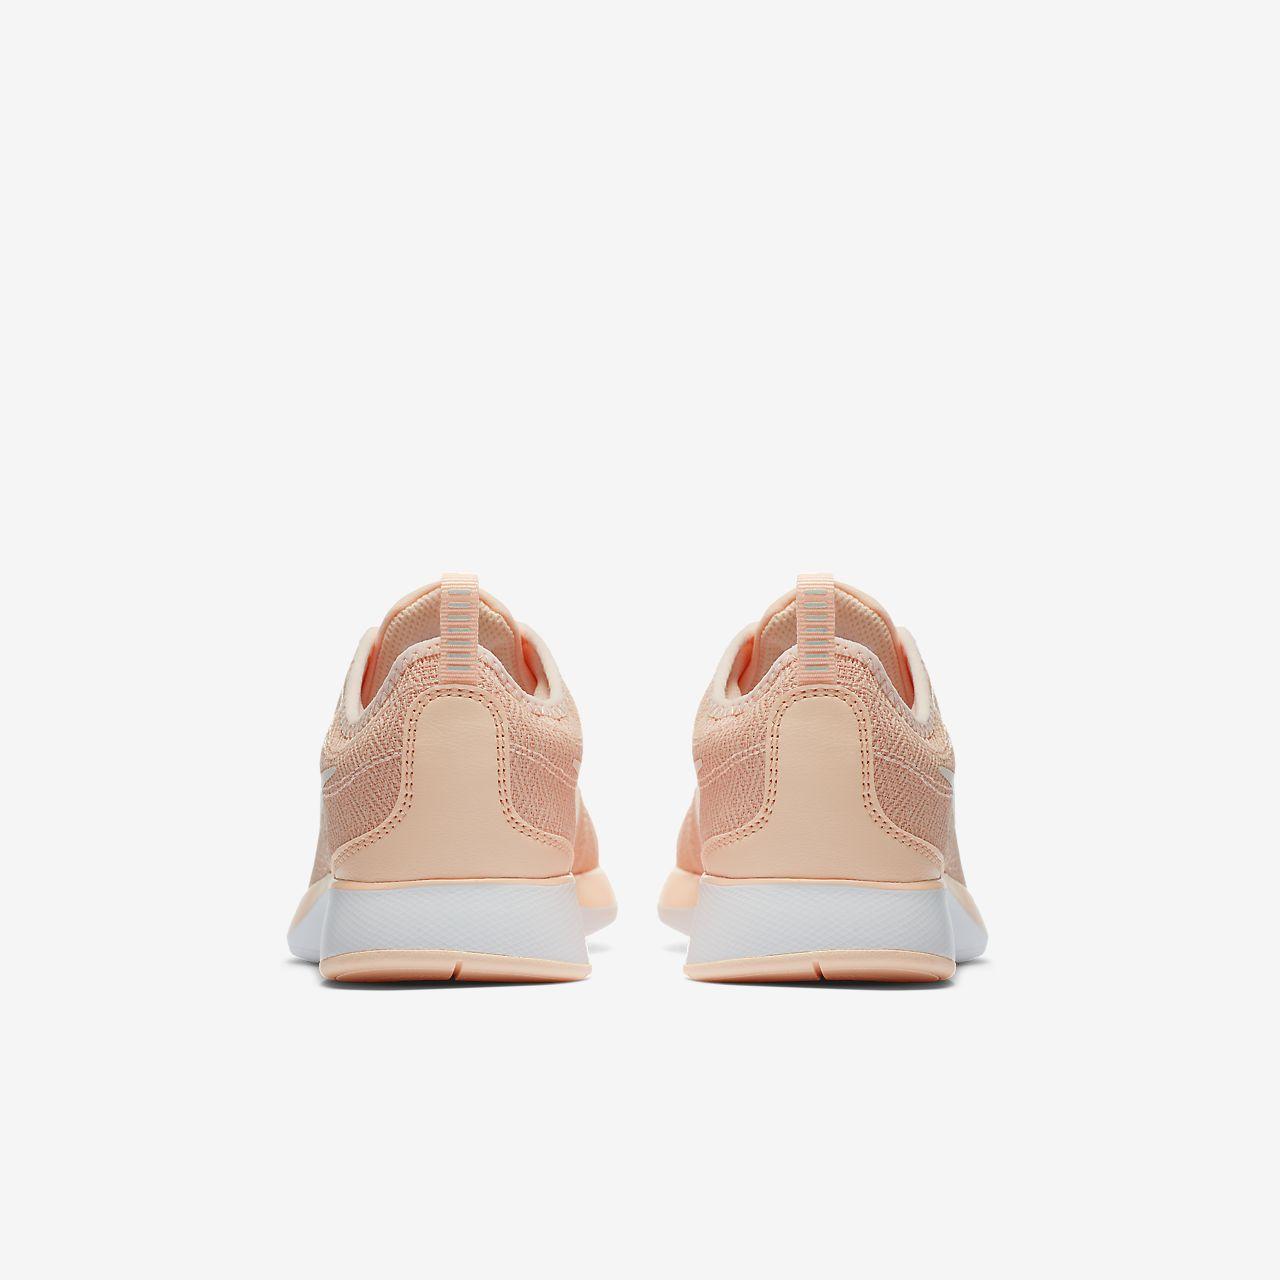 ... Nike Dualtone Racer SE Older Kids' Shoe